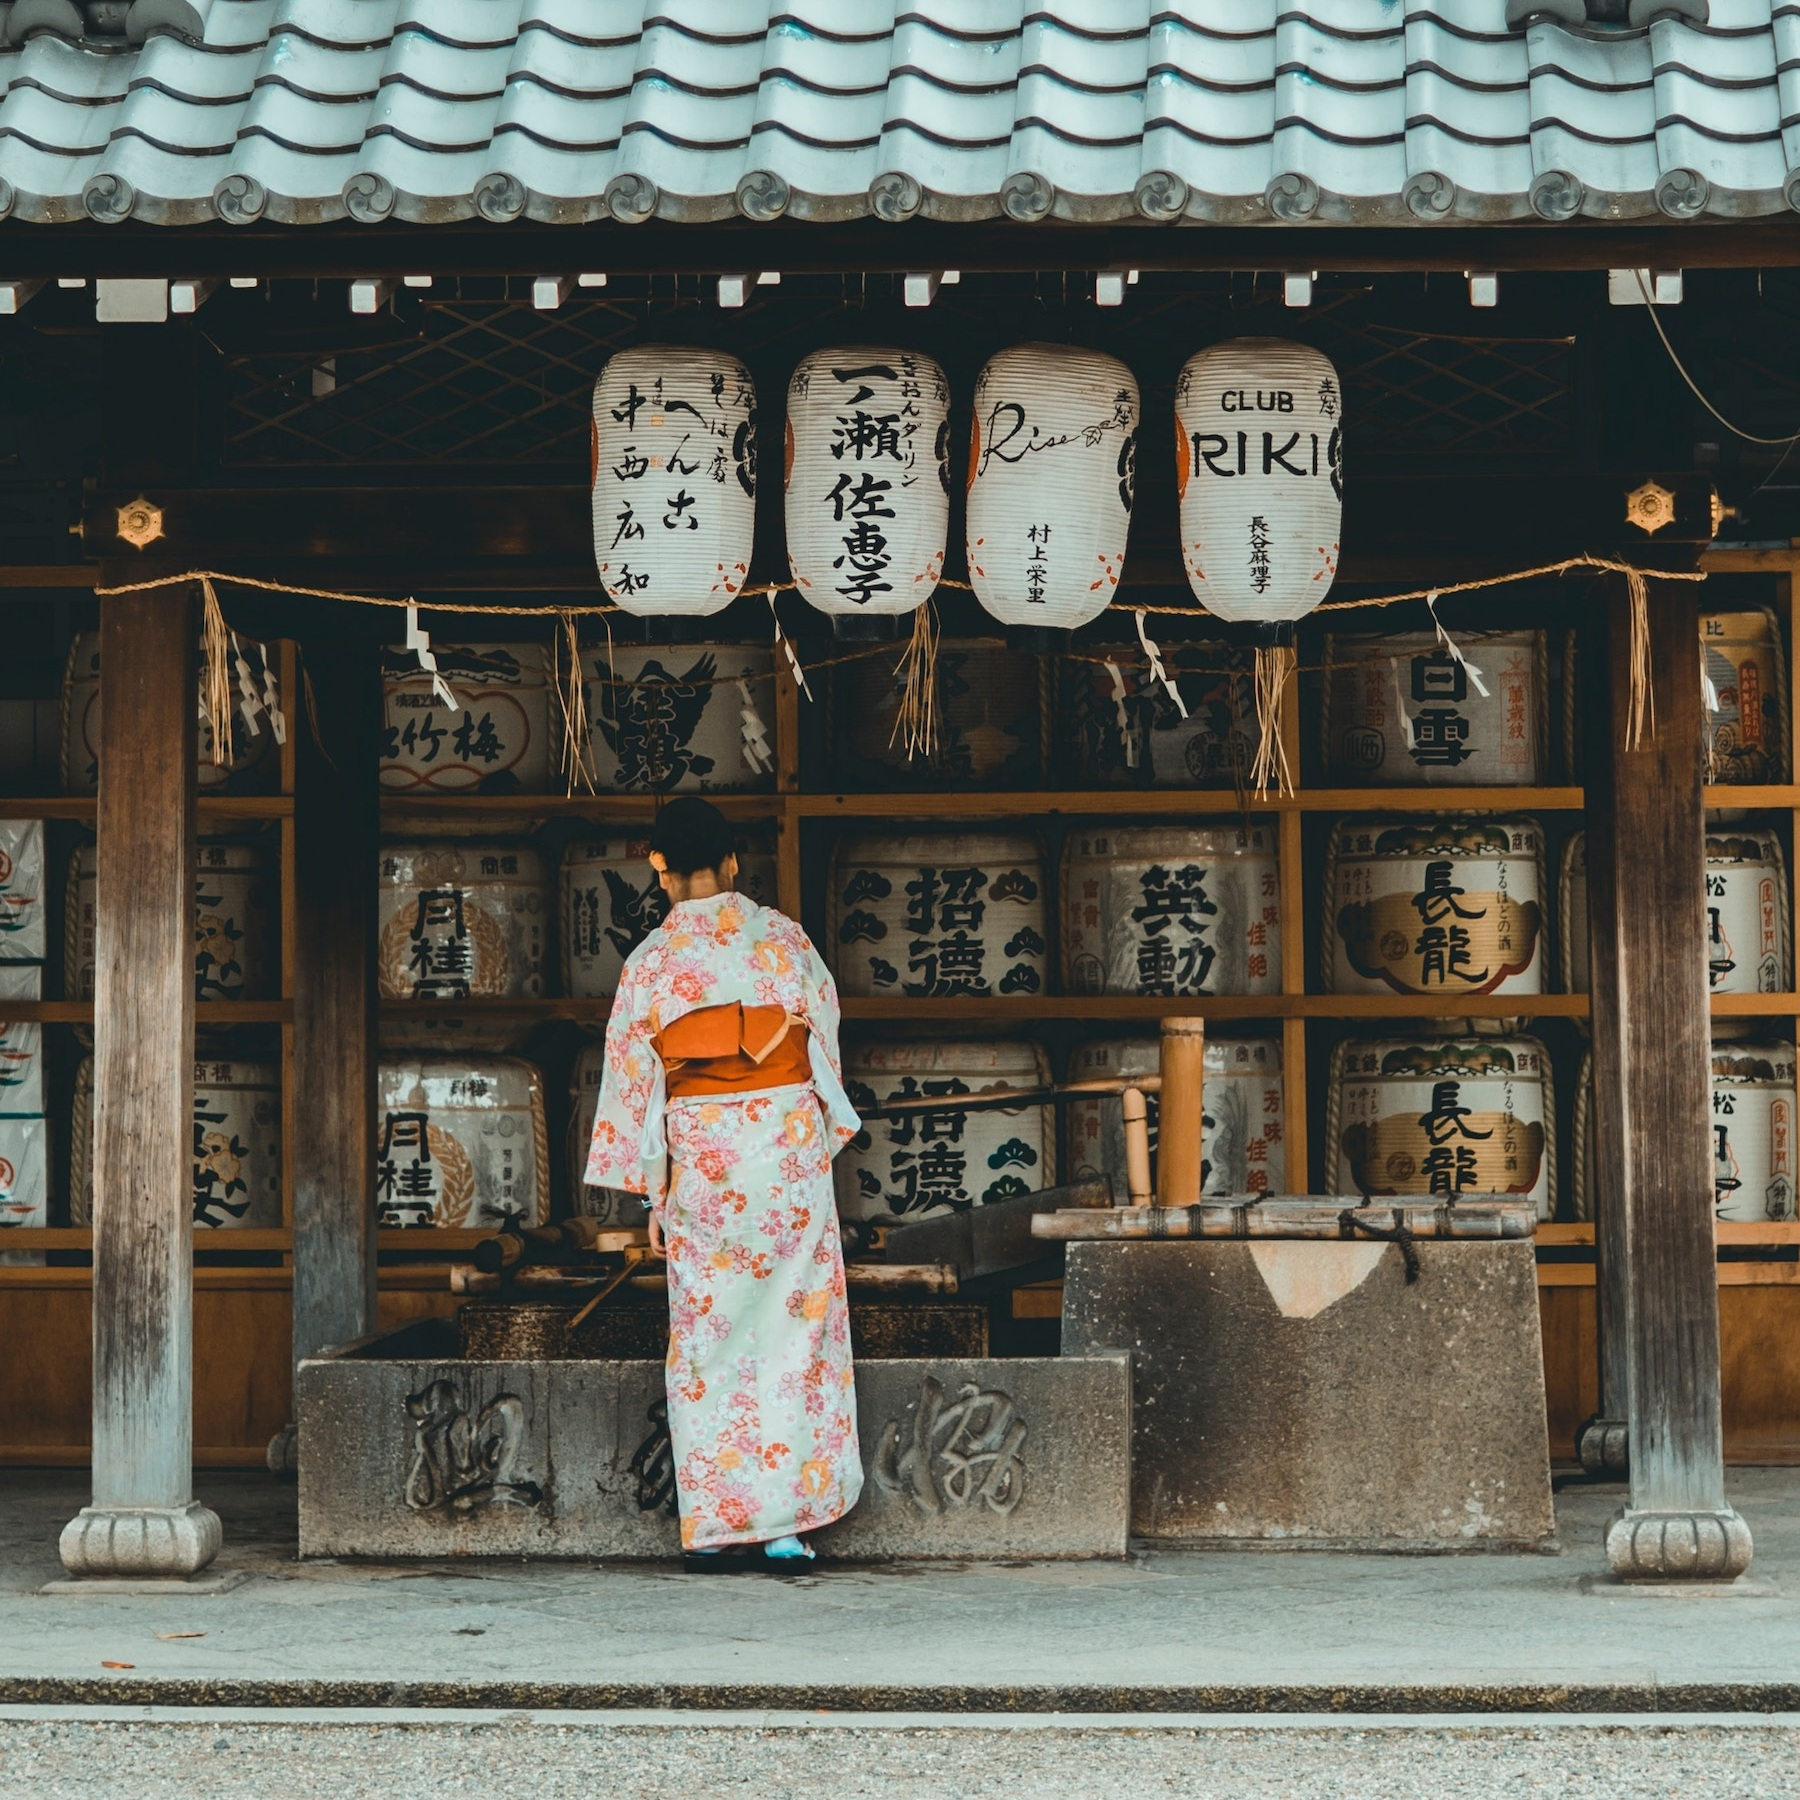 Sake barrels outside of a  izakayas  drinking den